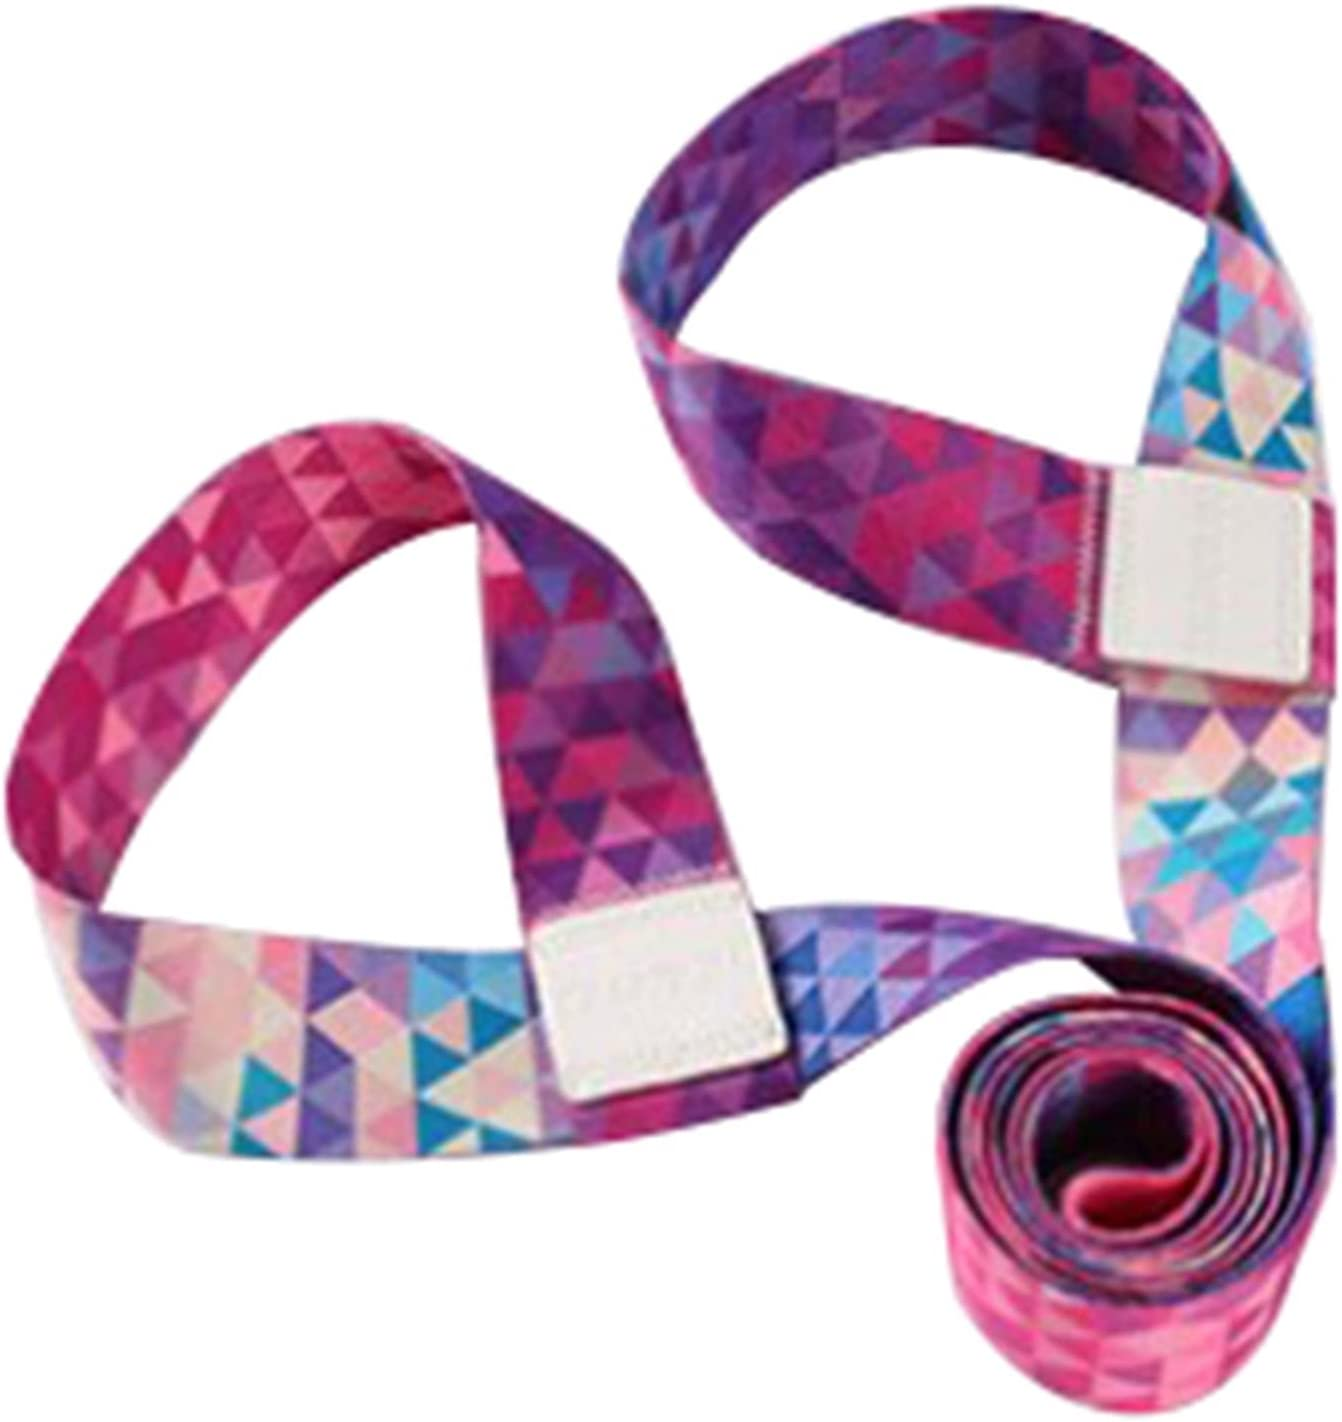 JUSTJING Yoga Adjustable Shoulder famous Strap Band Mat Sh Carrier Phoenix Mall